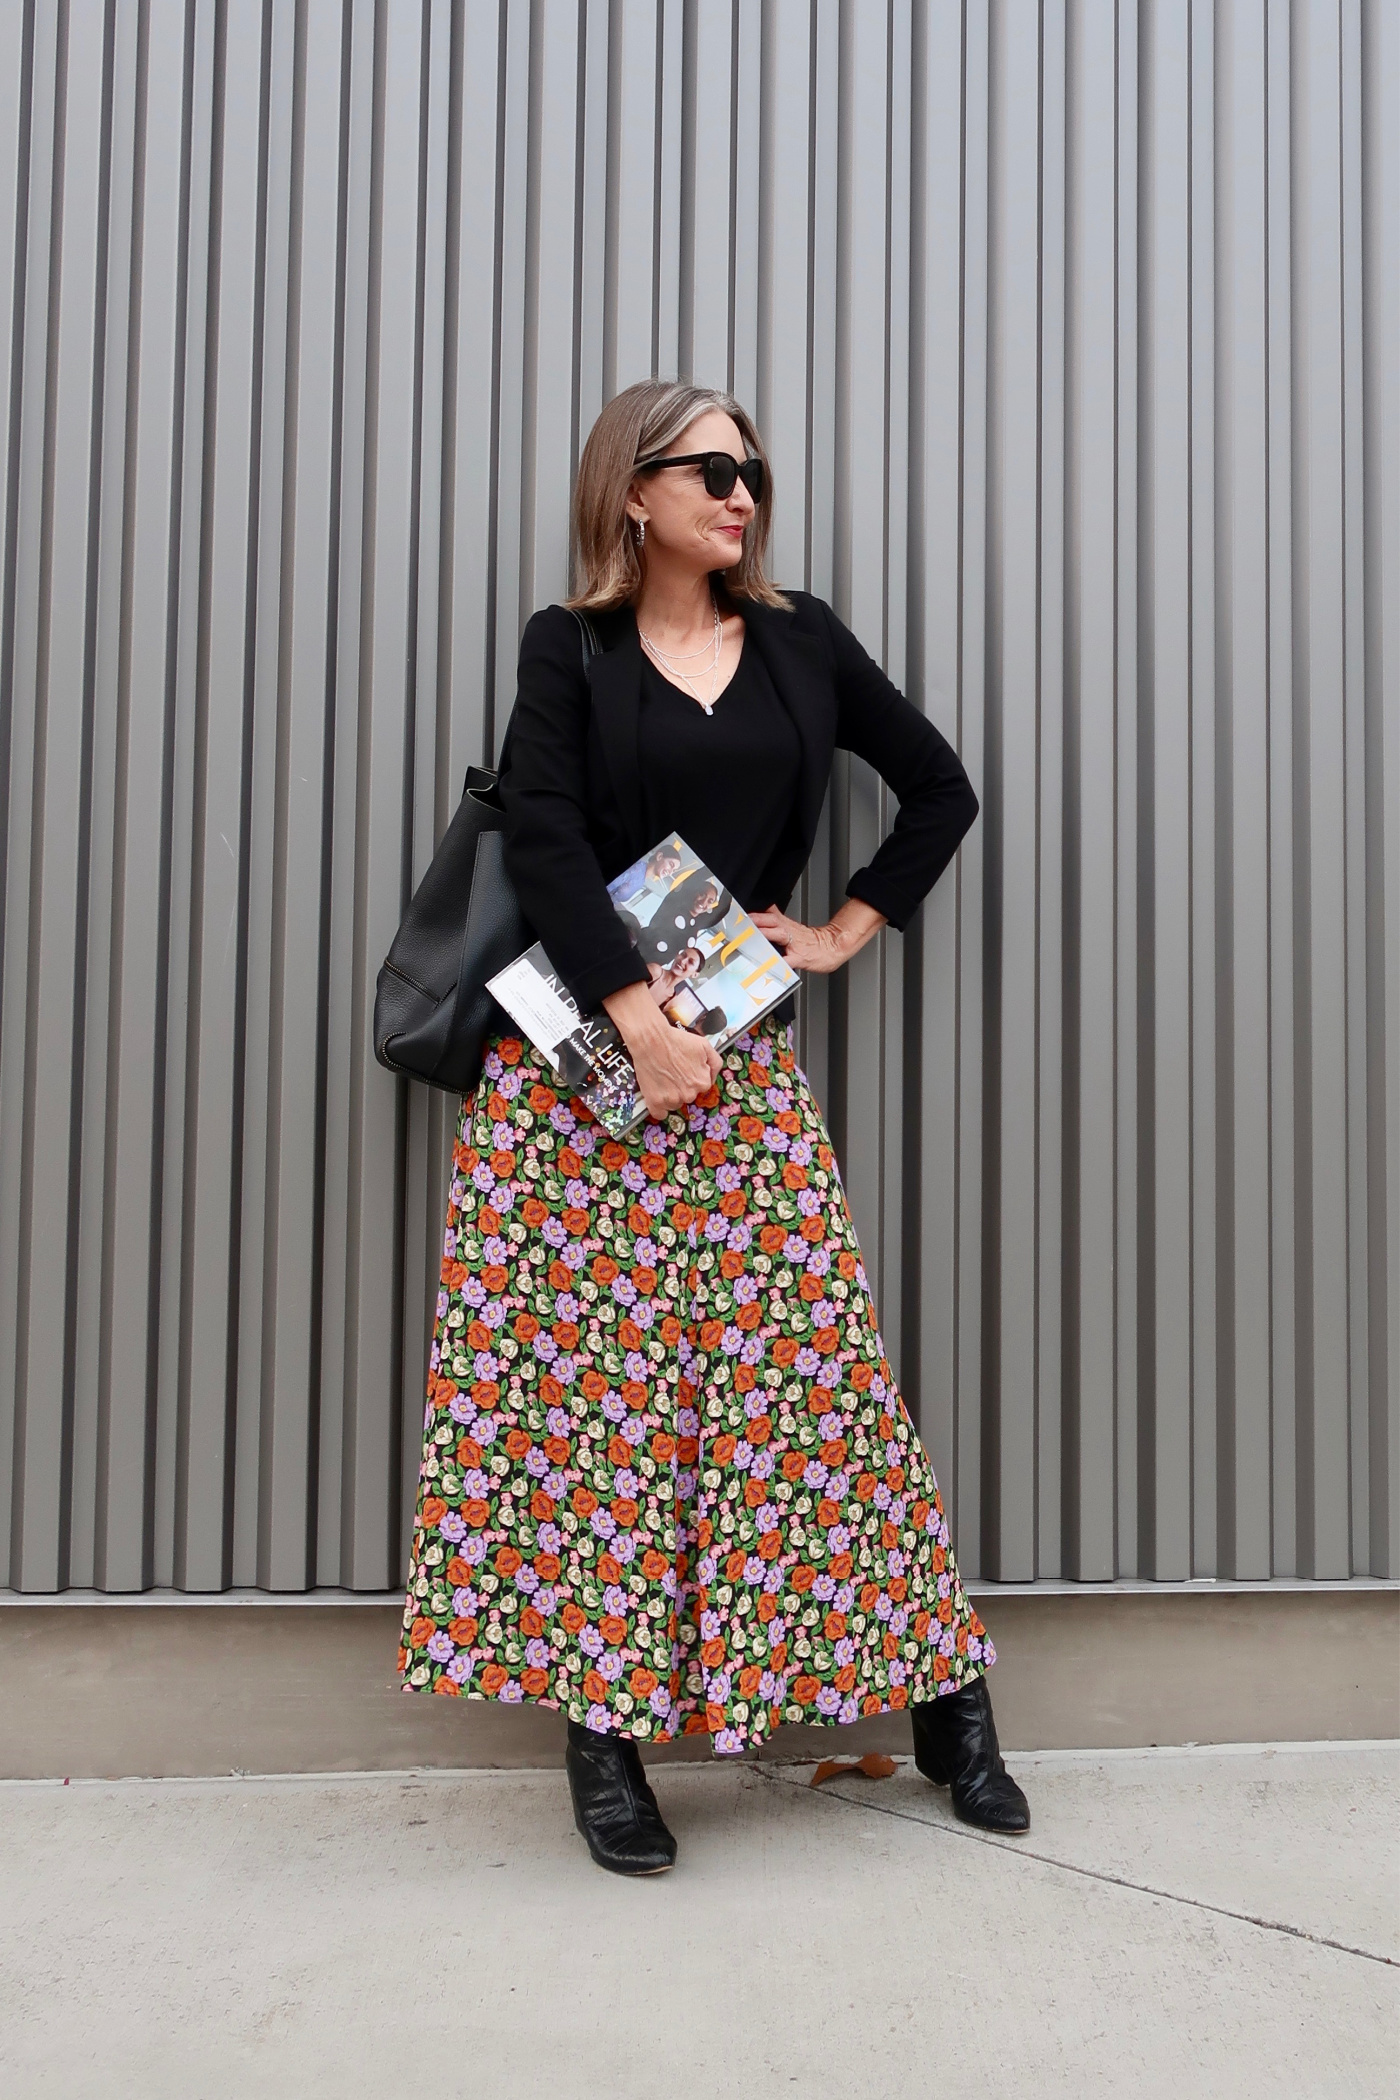 Teacher style, midi skirt, summer to fall transition